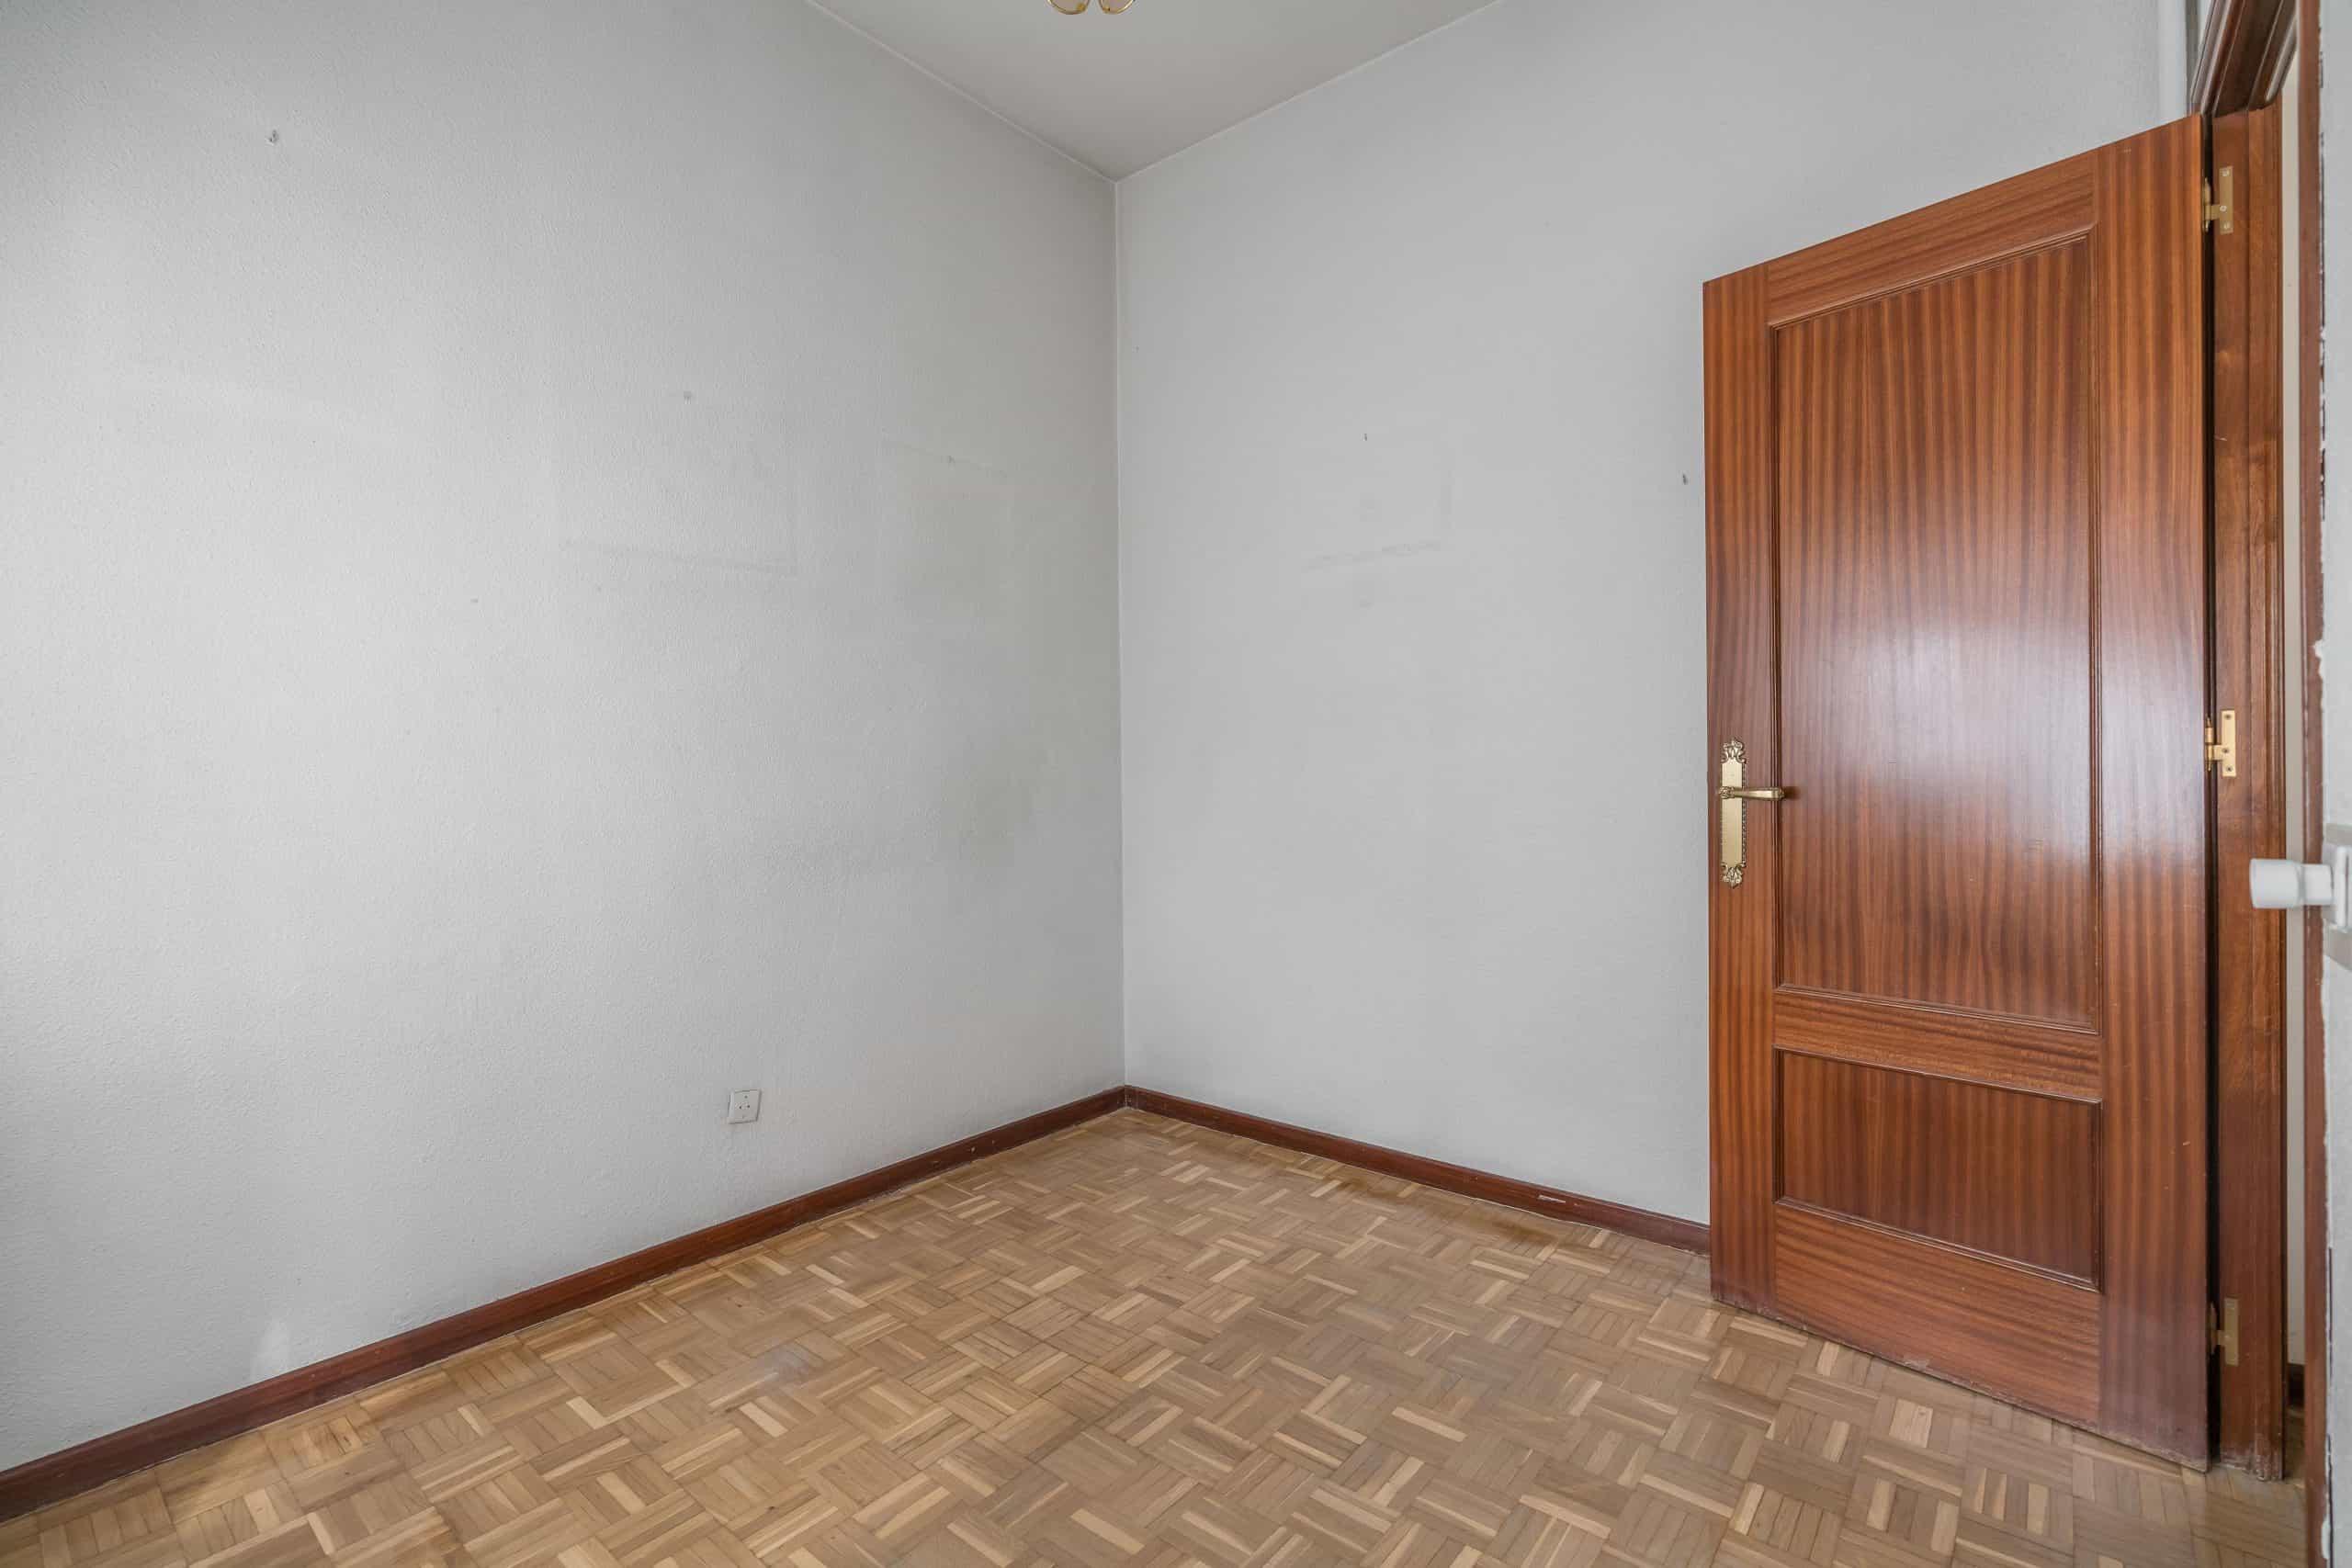 Agencia Inmobiliaria de Madrid-FUTUROCASA-Zona ARGANZUELA-LEGAZPI -calle Jaime Conquistador 48- 2do Dormitorio 3